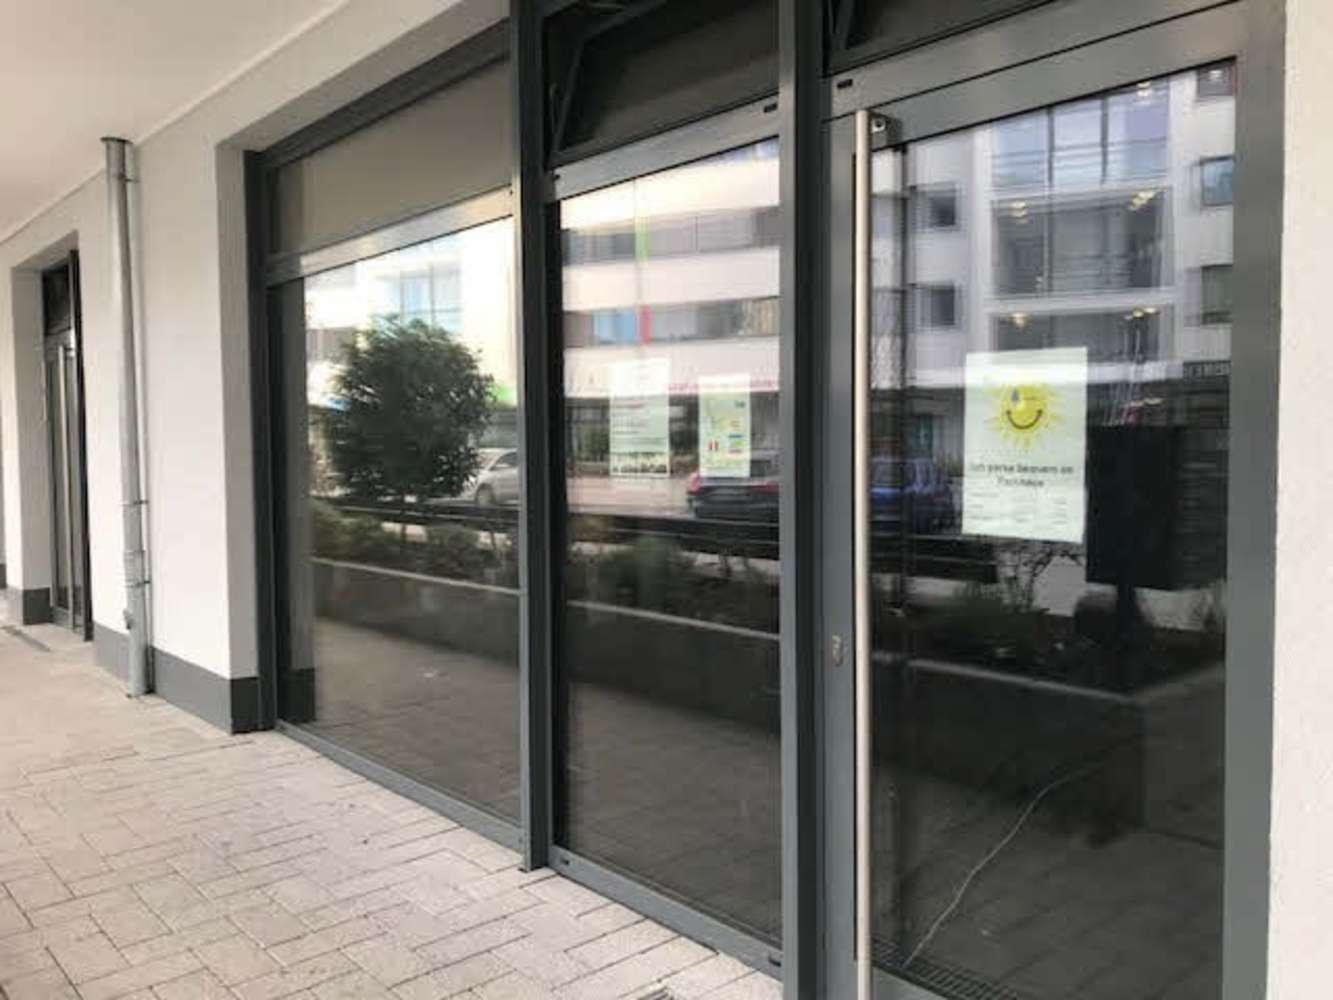 Ladenflächen Hanau, 63450 - Ladenfläche - Hanau - E0883 - 9858573